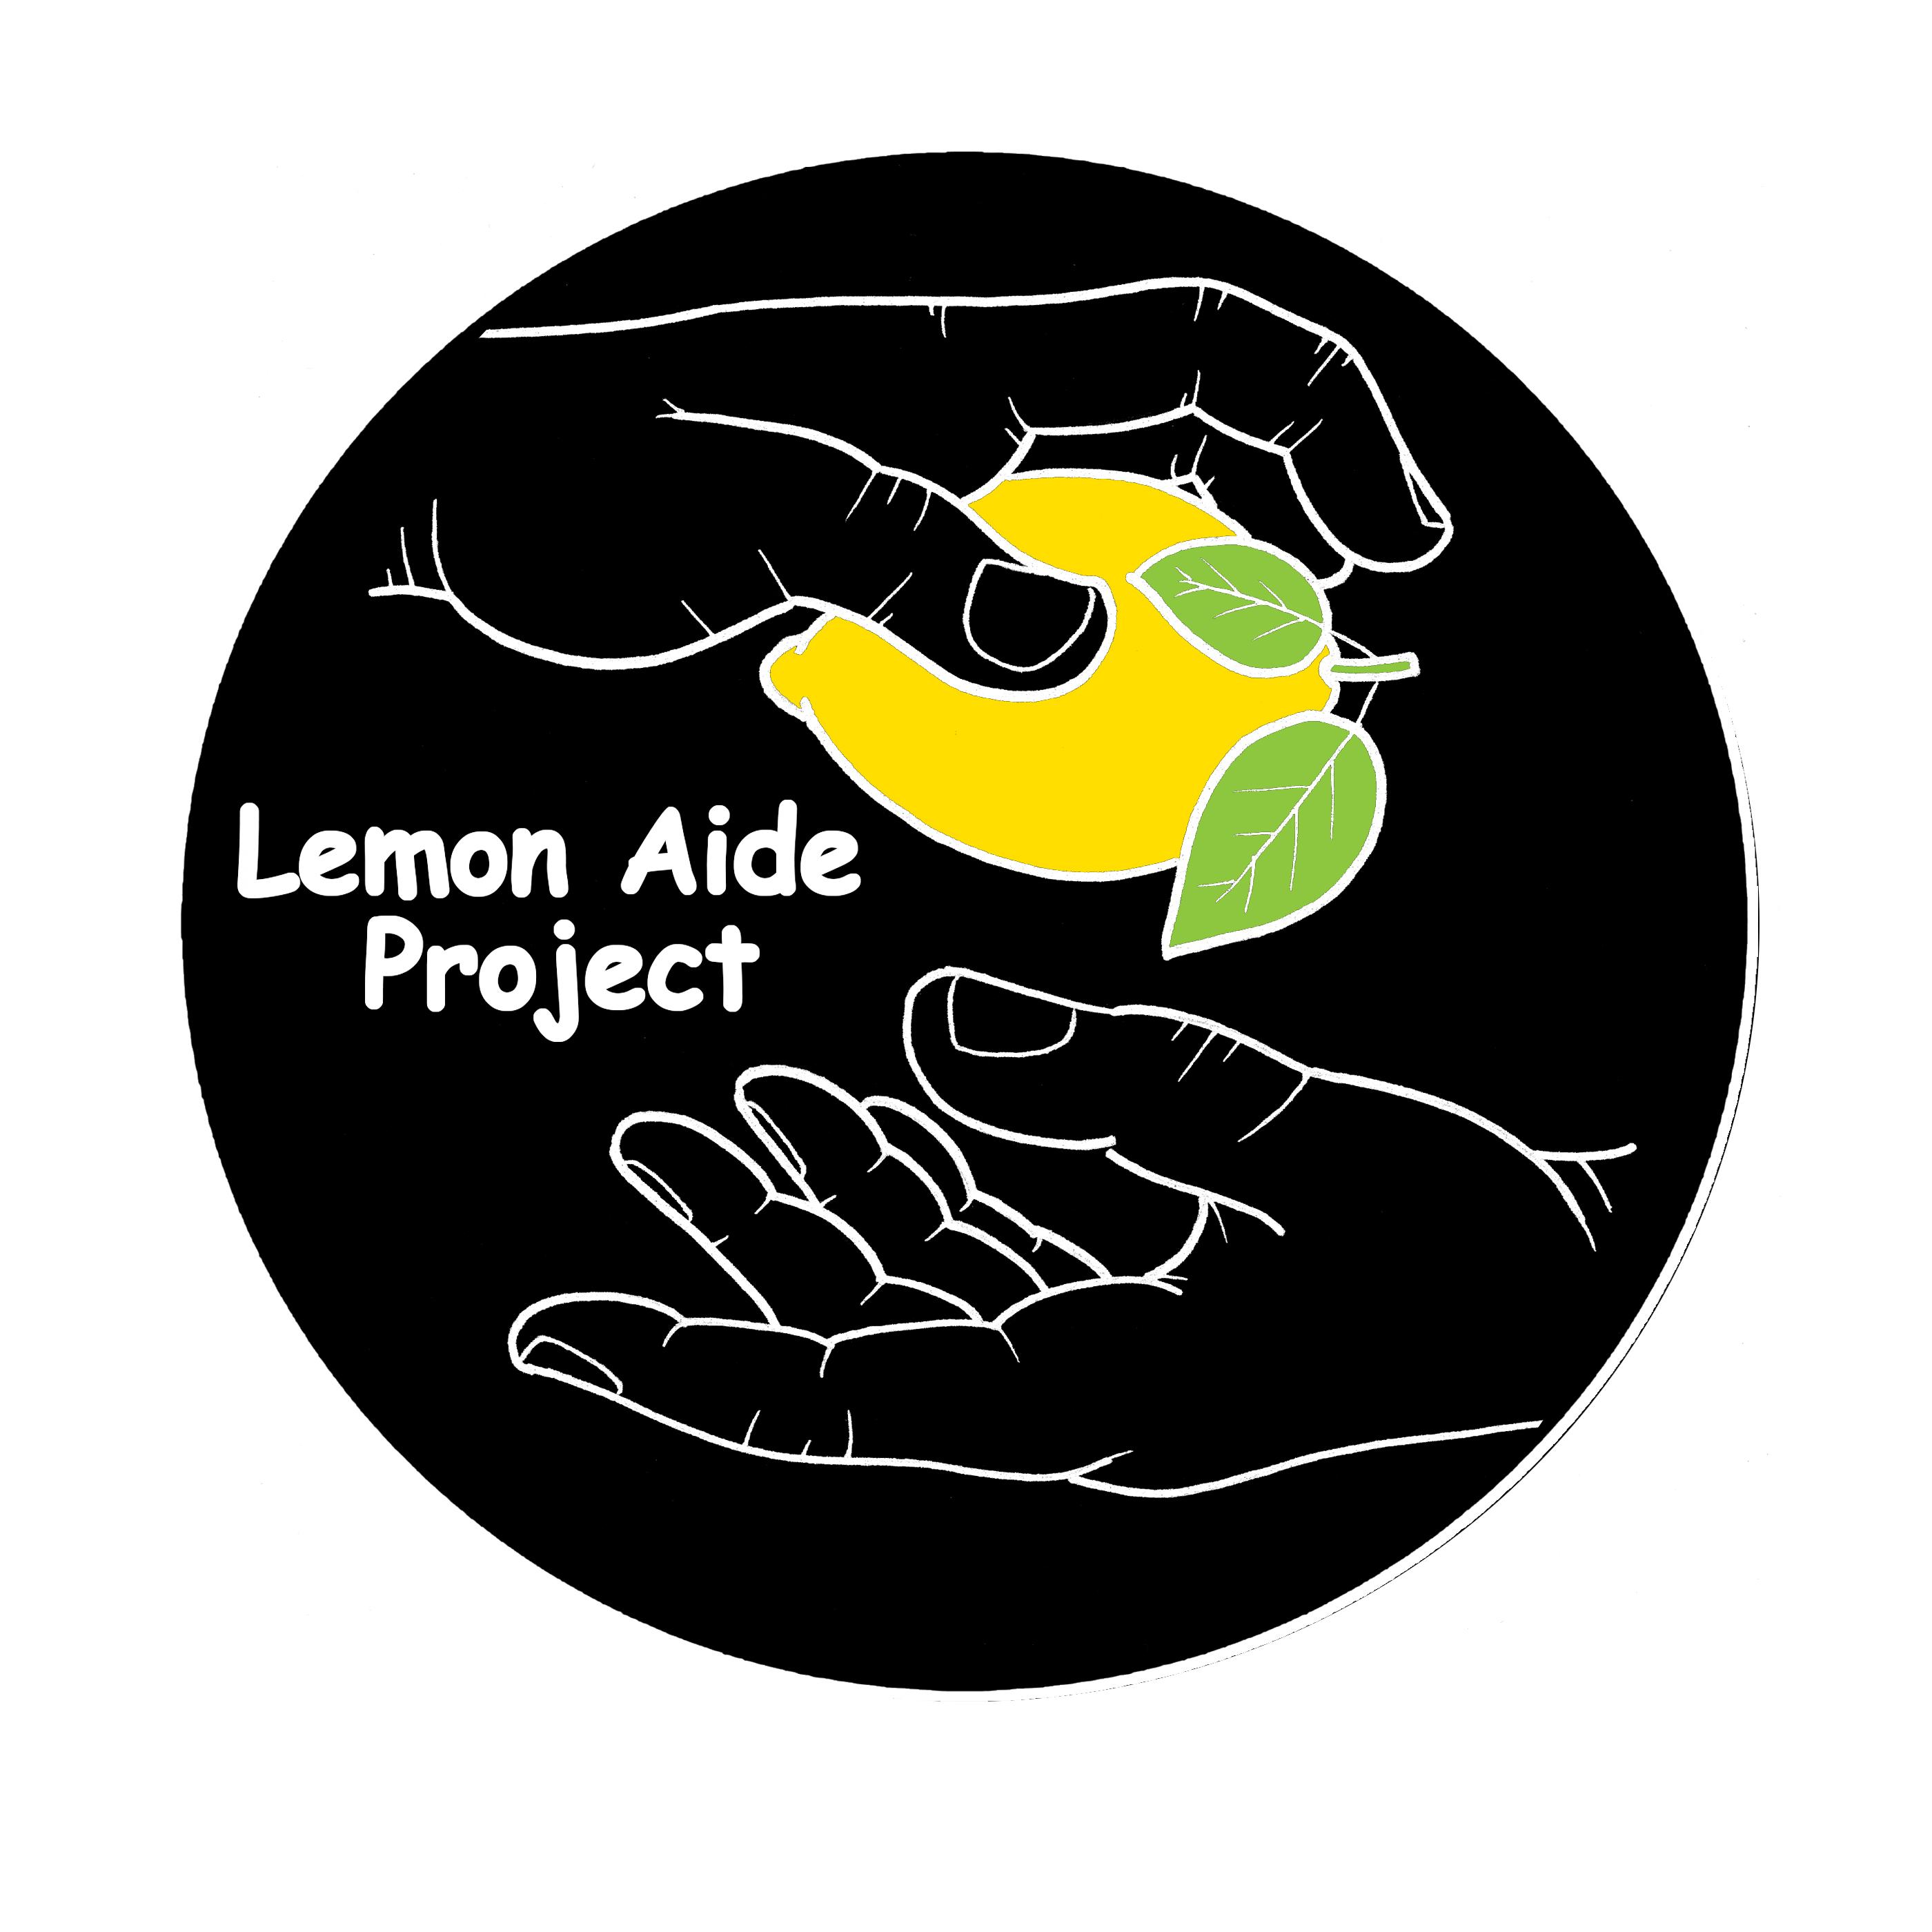 lemon_aide_logo_blk